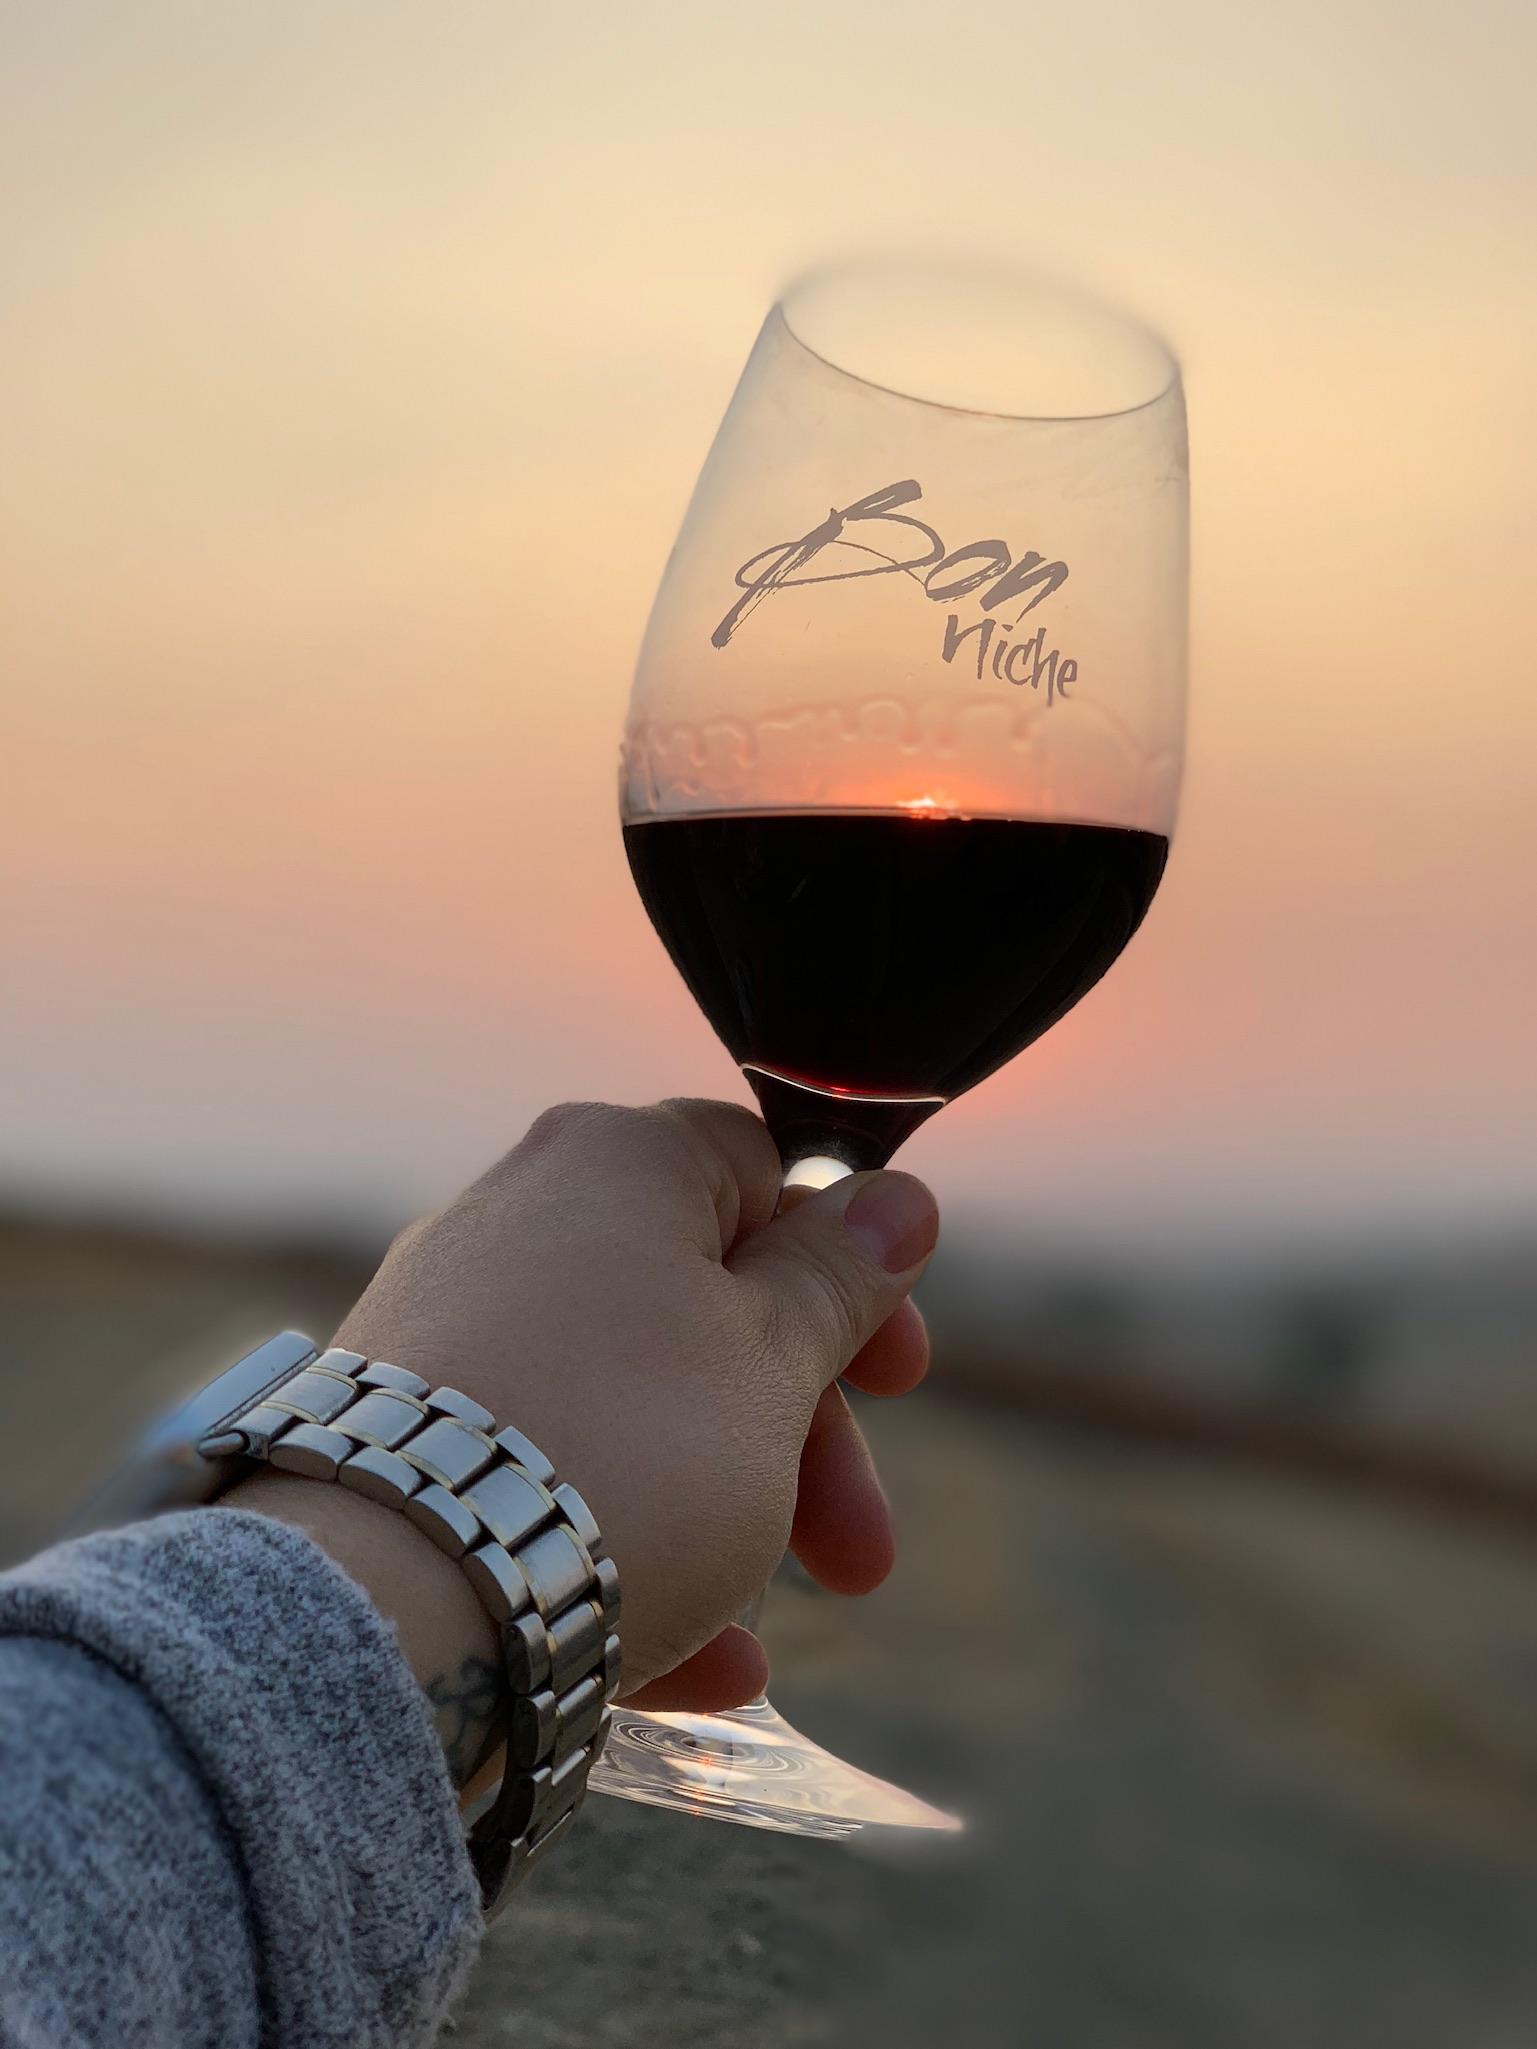 Bon Niche Wine Glass bottle